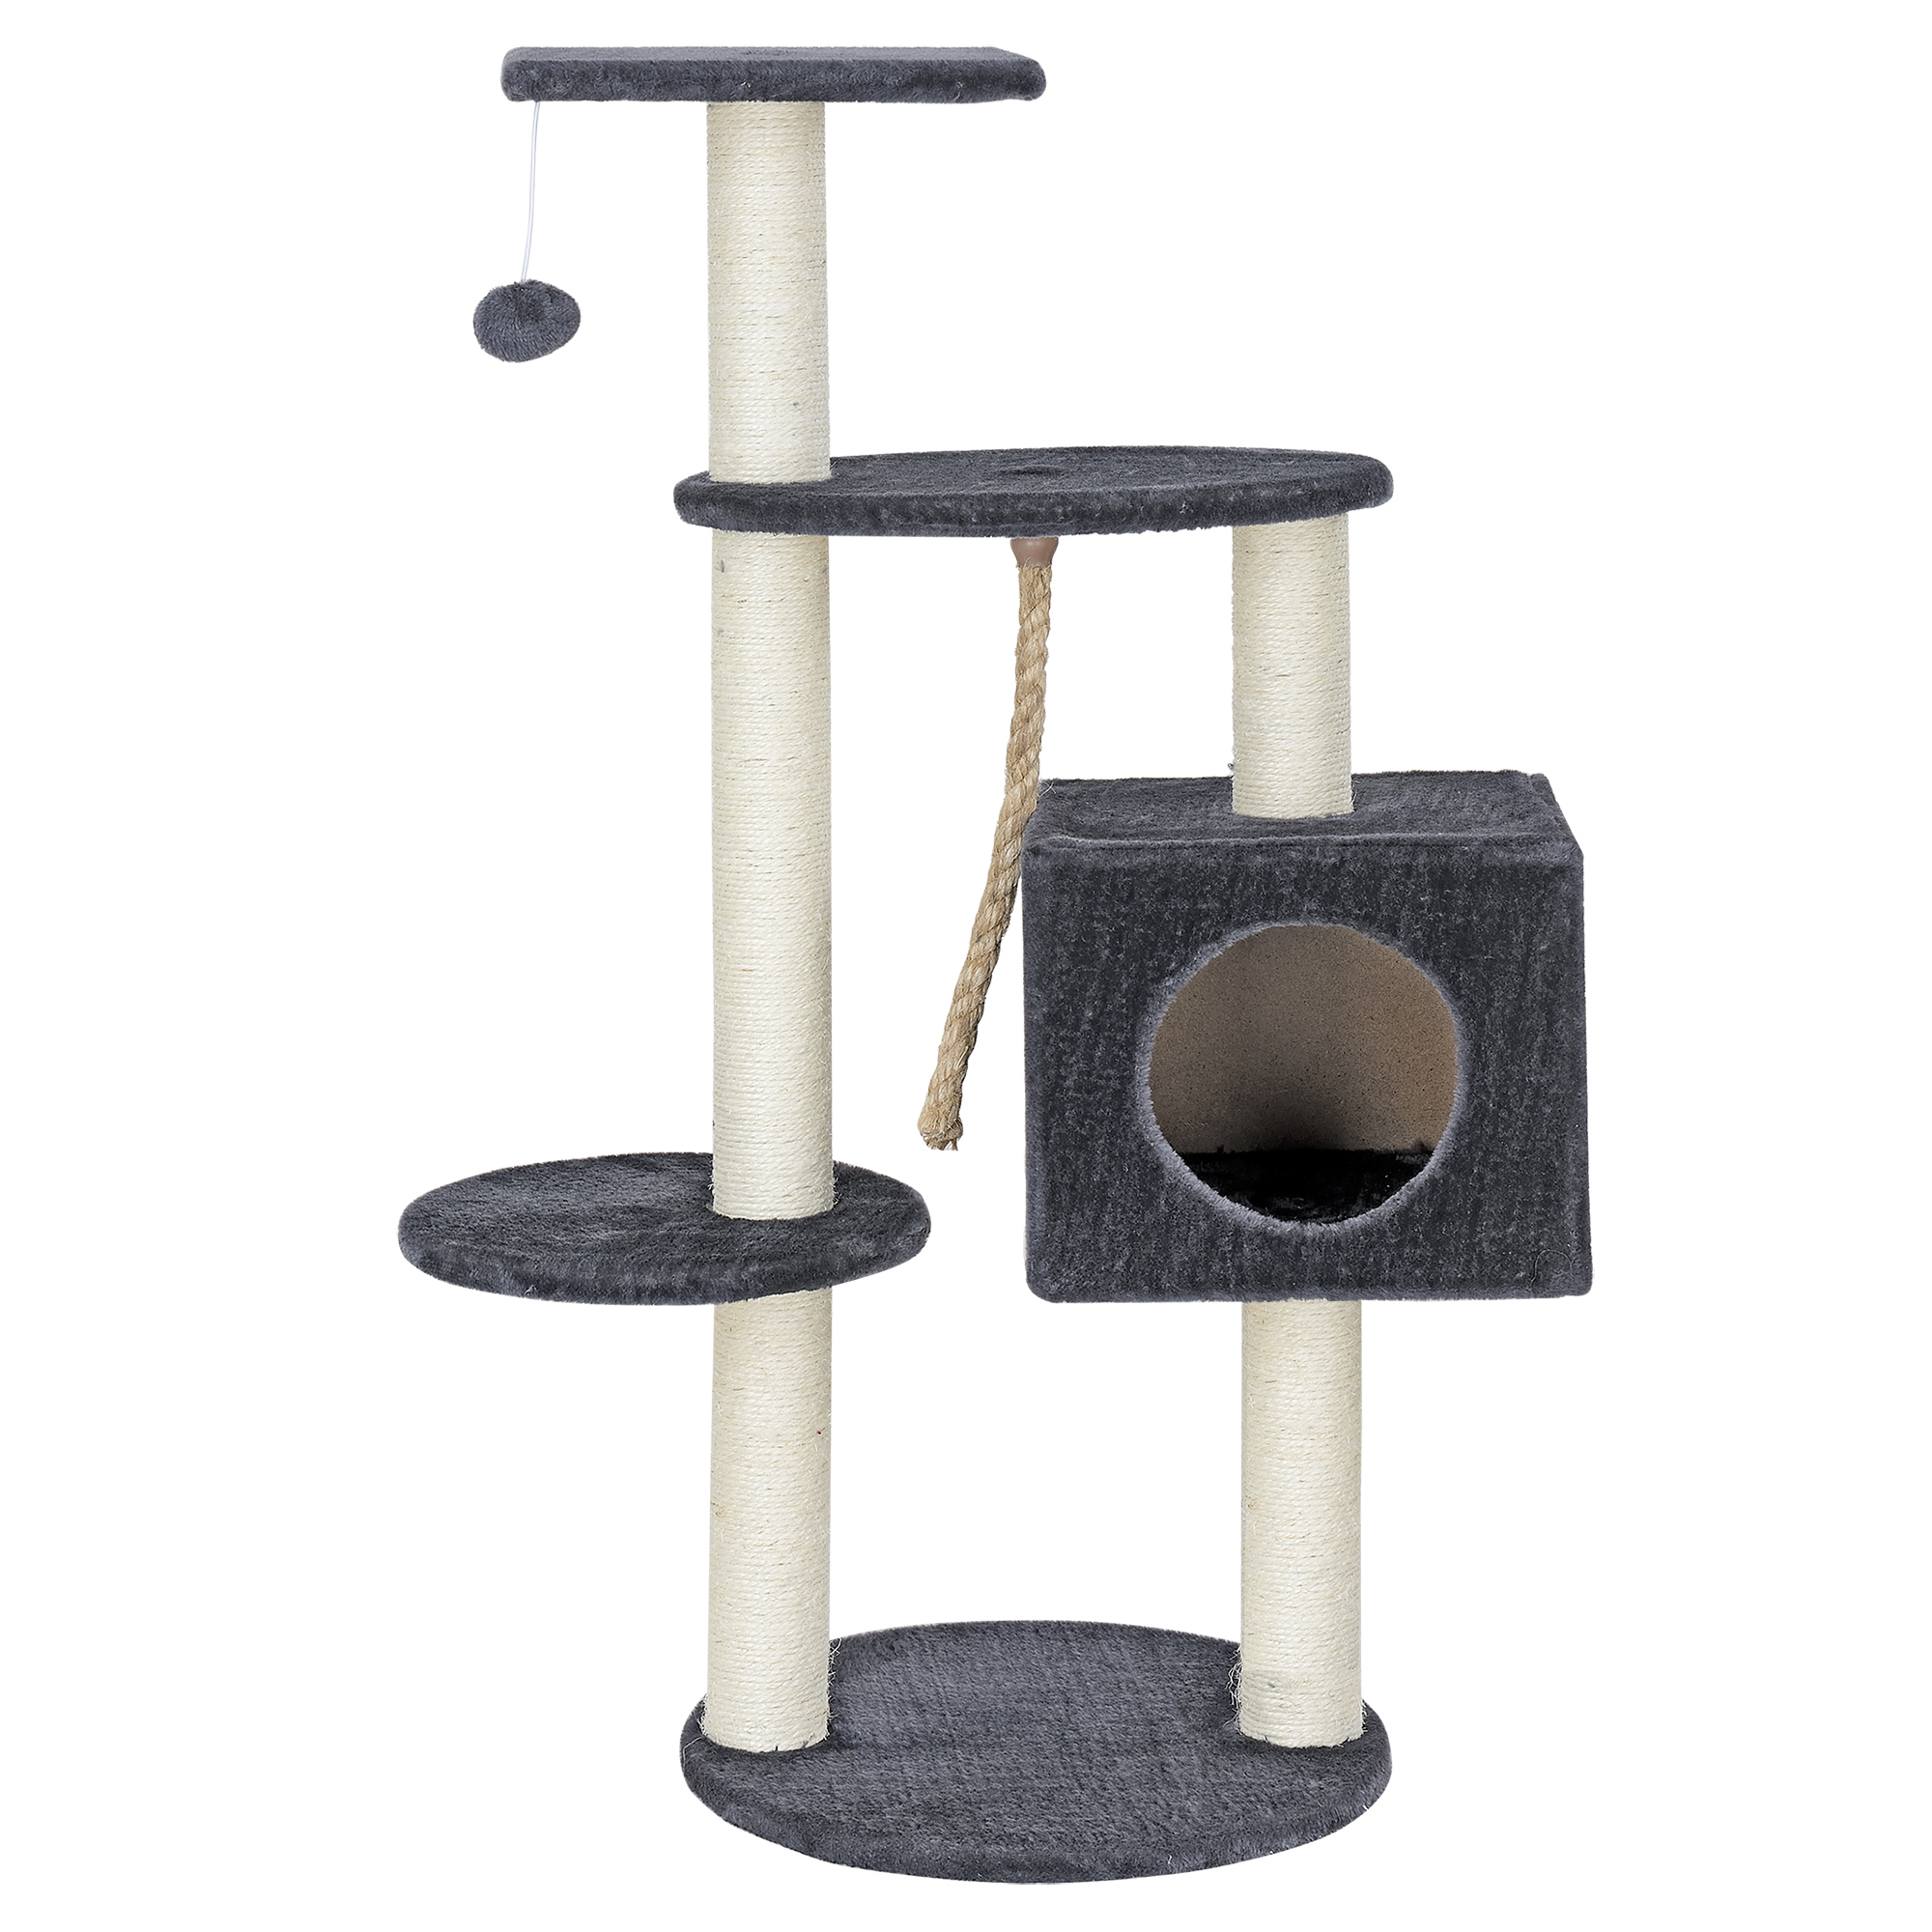 en.casa]® design kratzbaum grau kletterbaum katzen baum